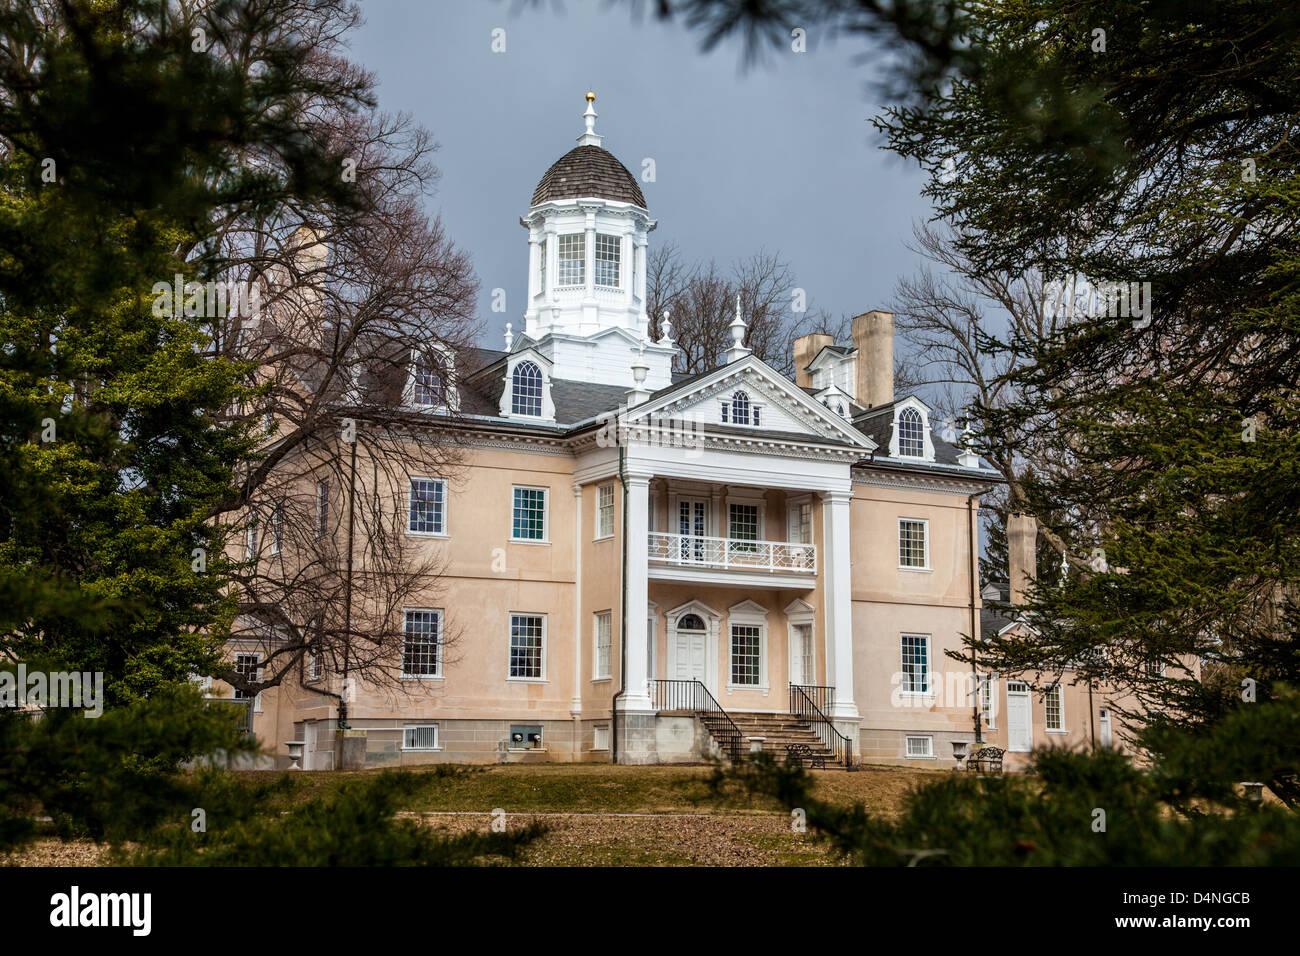 Hampton national historic site - Hampton National Historic Site Baltimore County Maryland